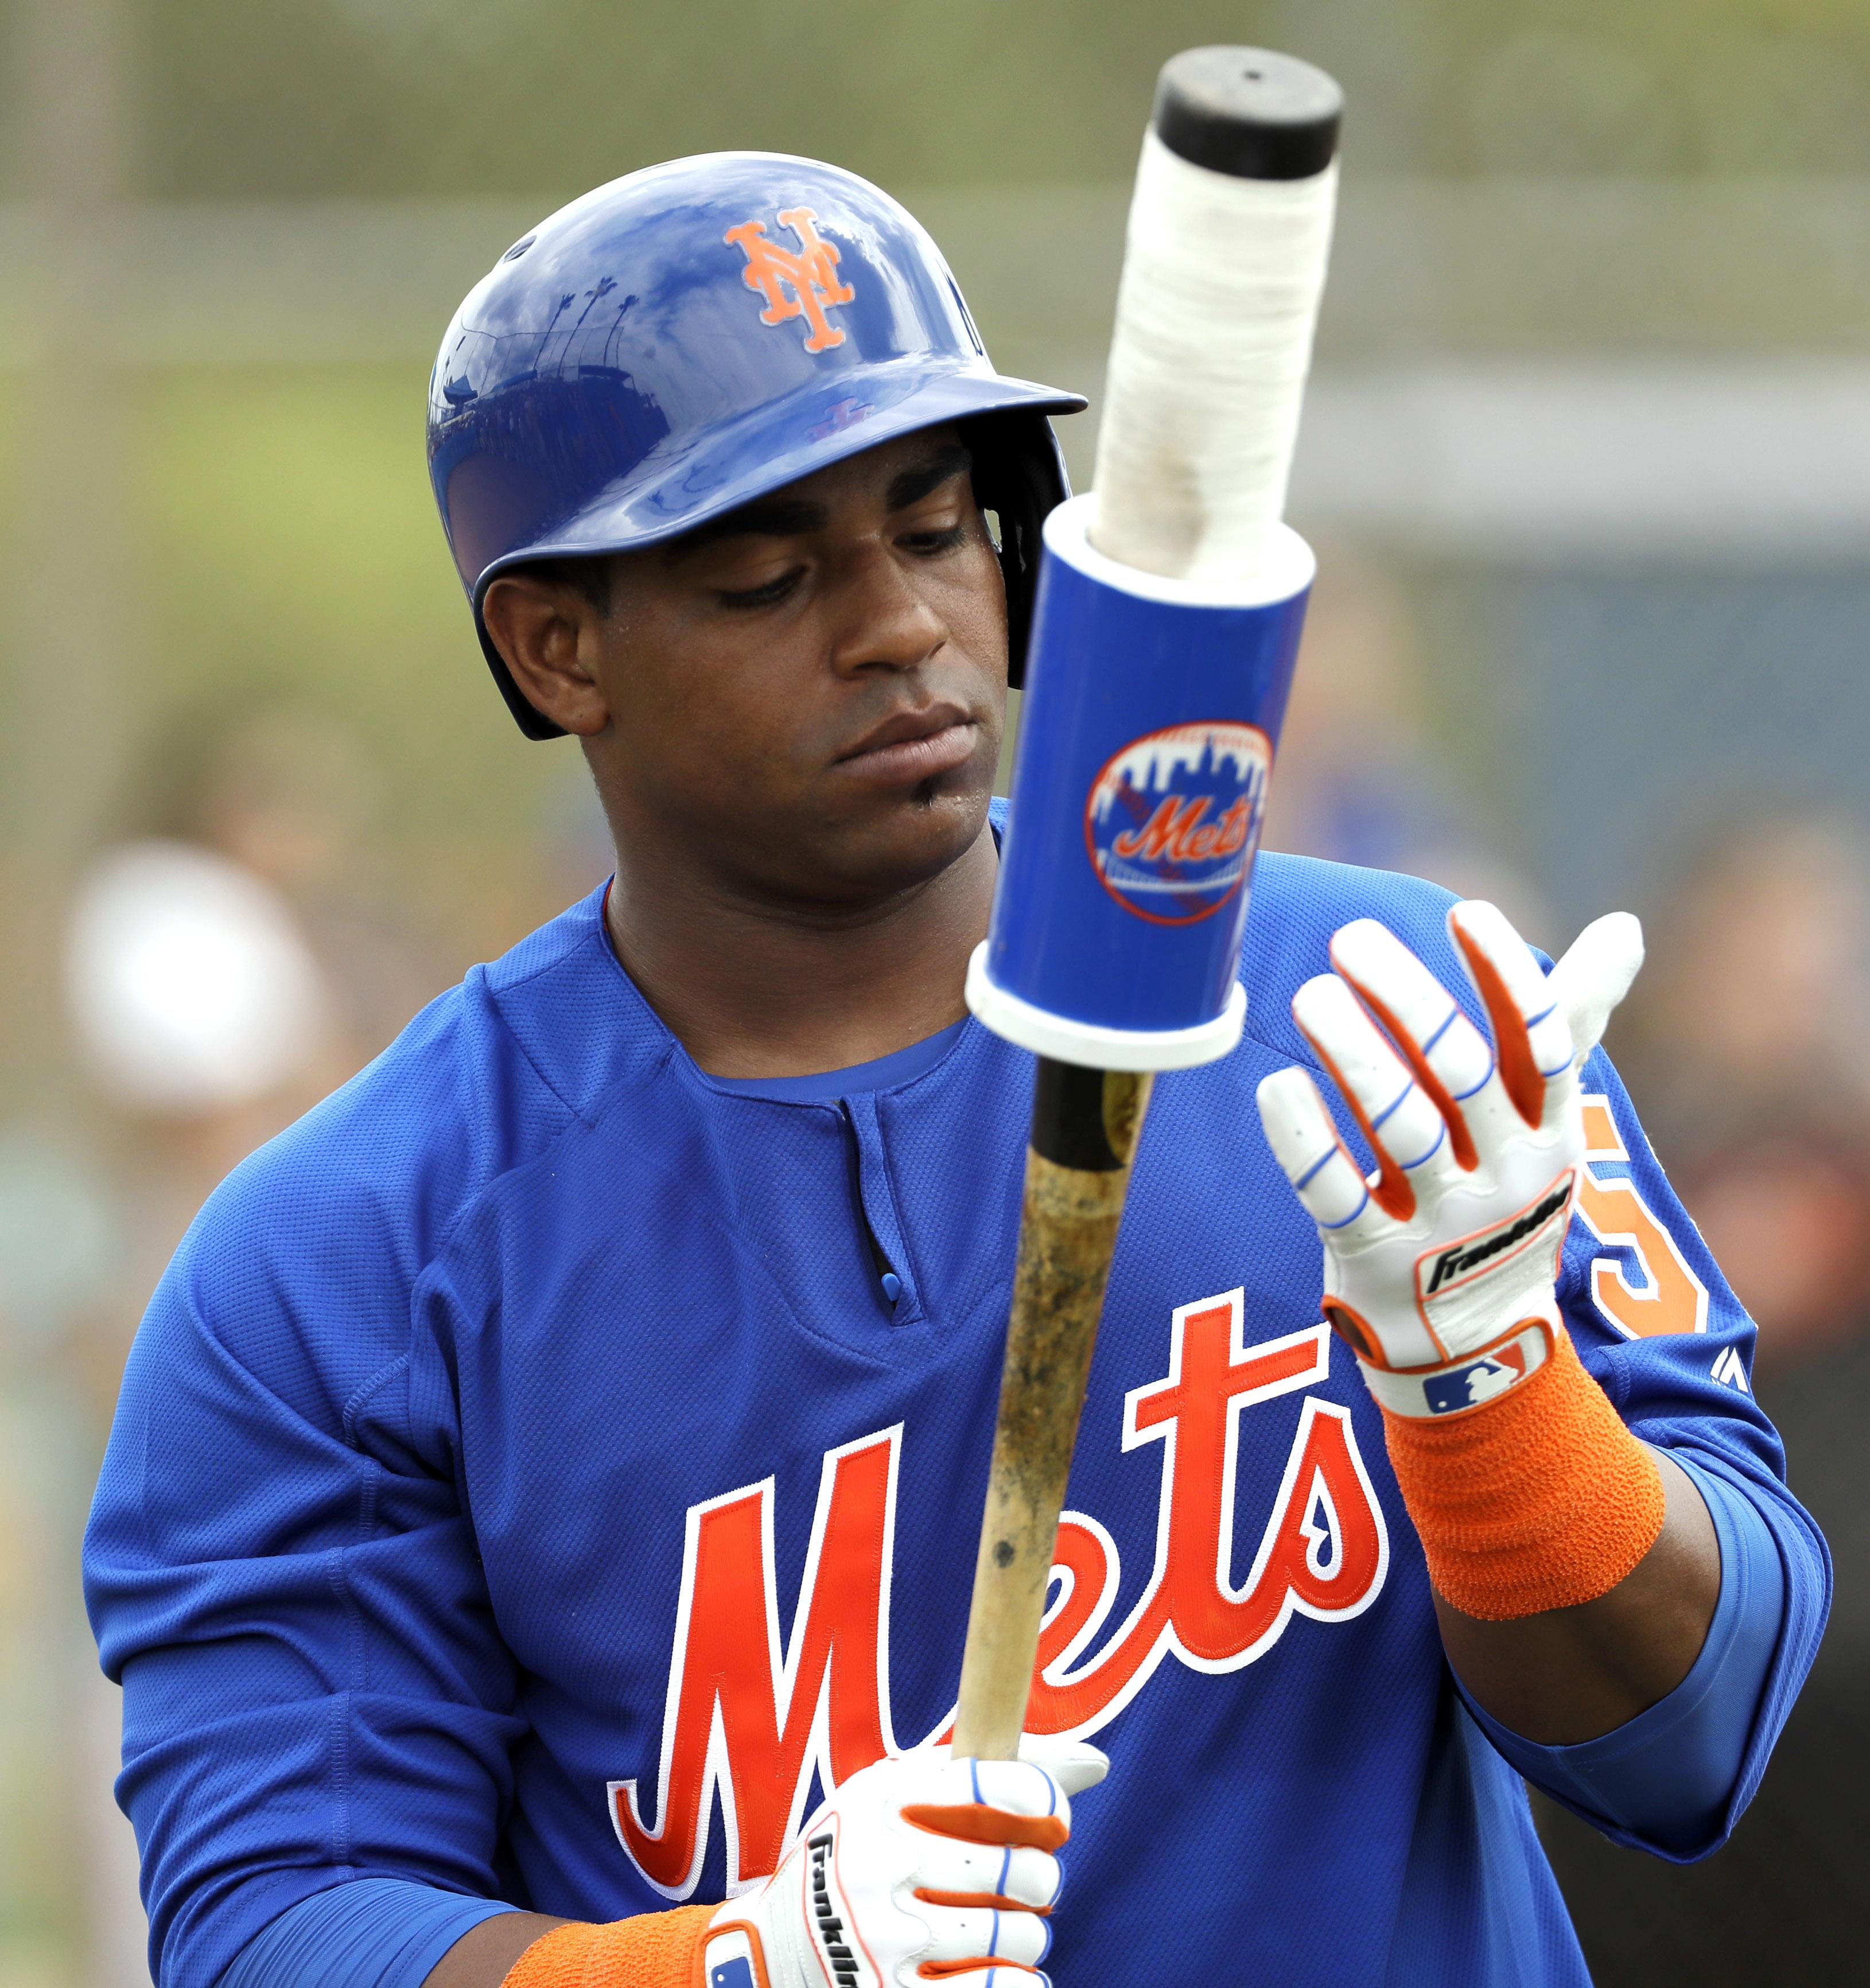 Mets_spring_baseball_70266